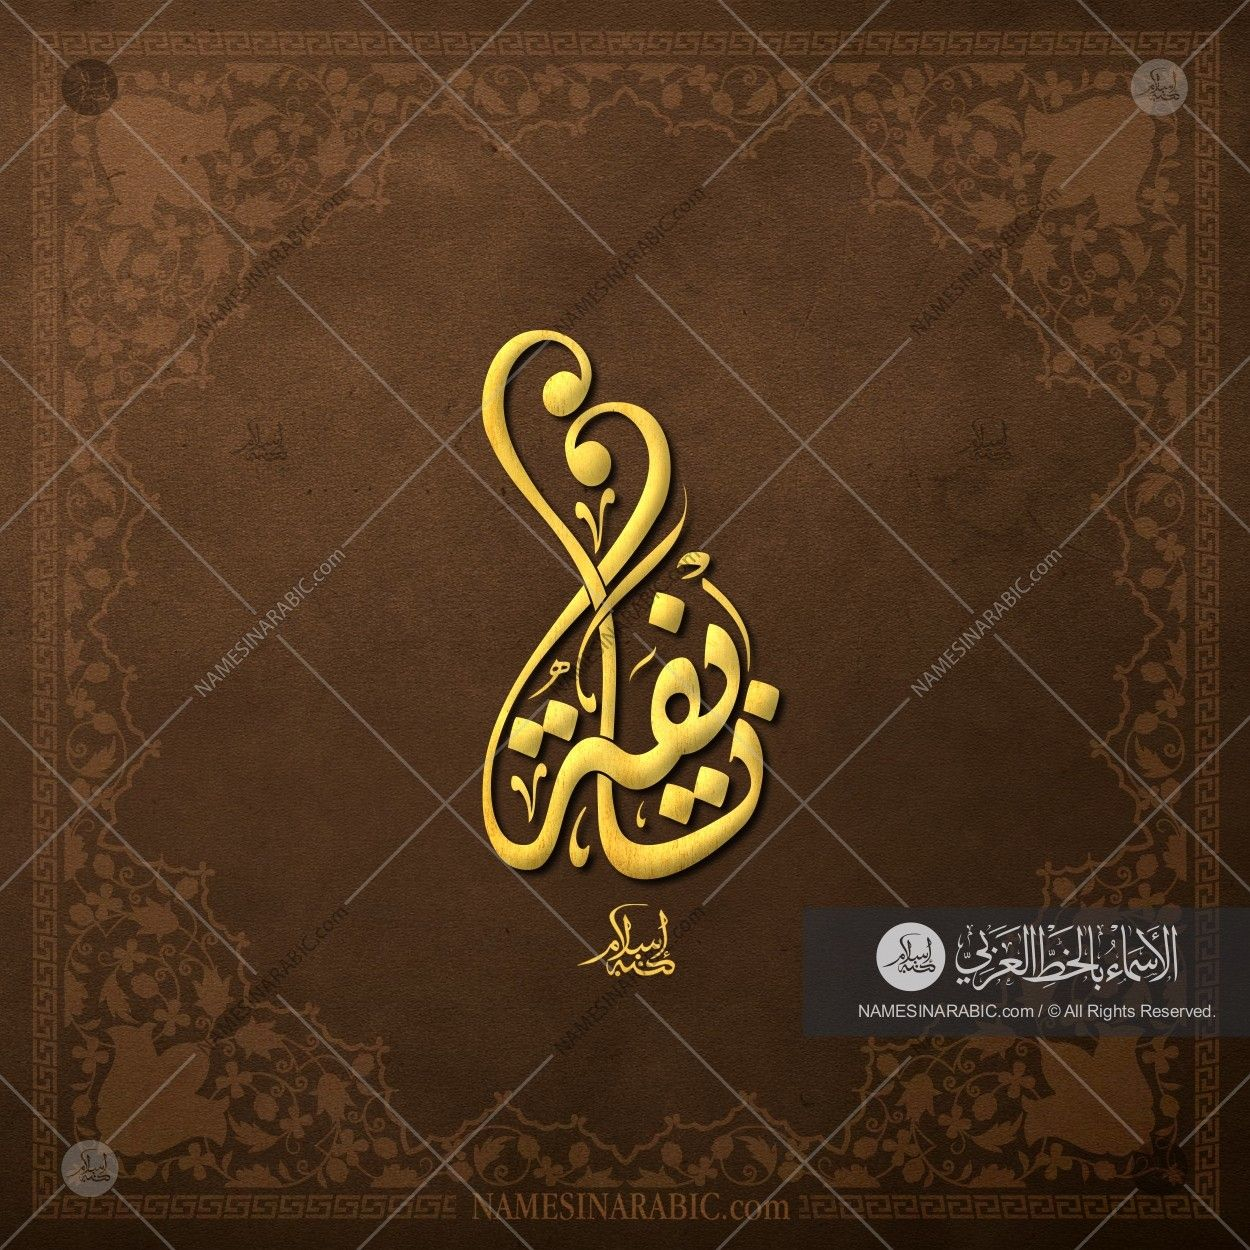 Naifa نايفة Names In Arabic Calligraphy Name 8516 Calligraphy Name Arabic Calligraphy Arabic Names